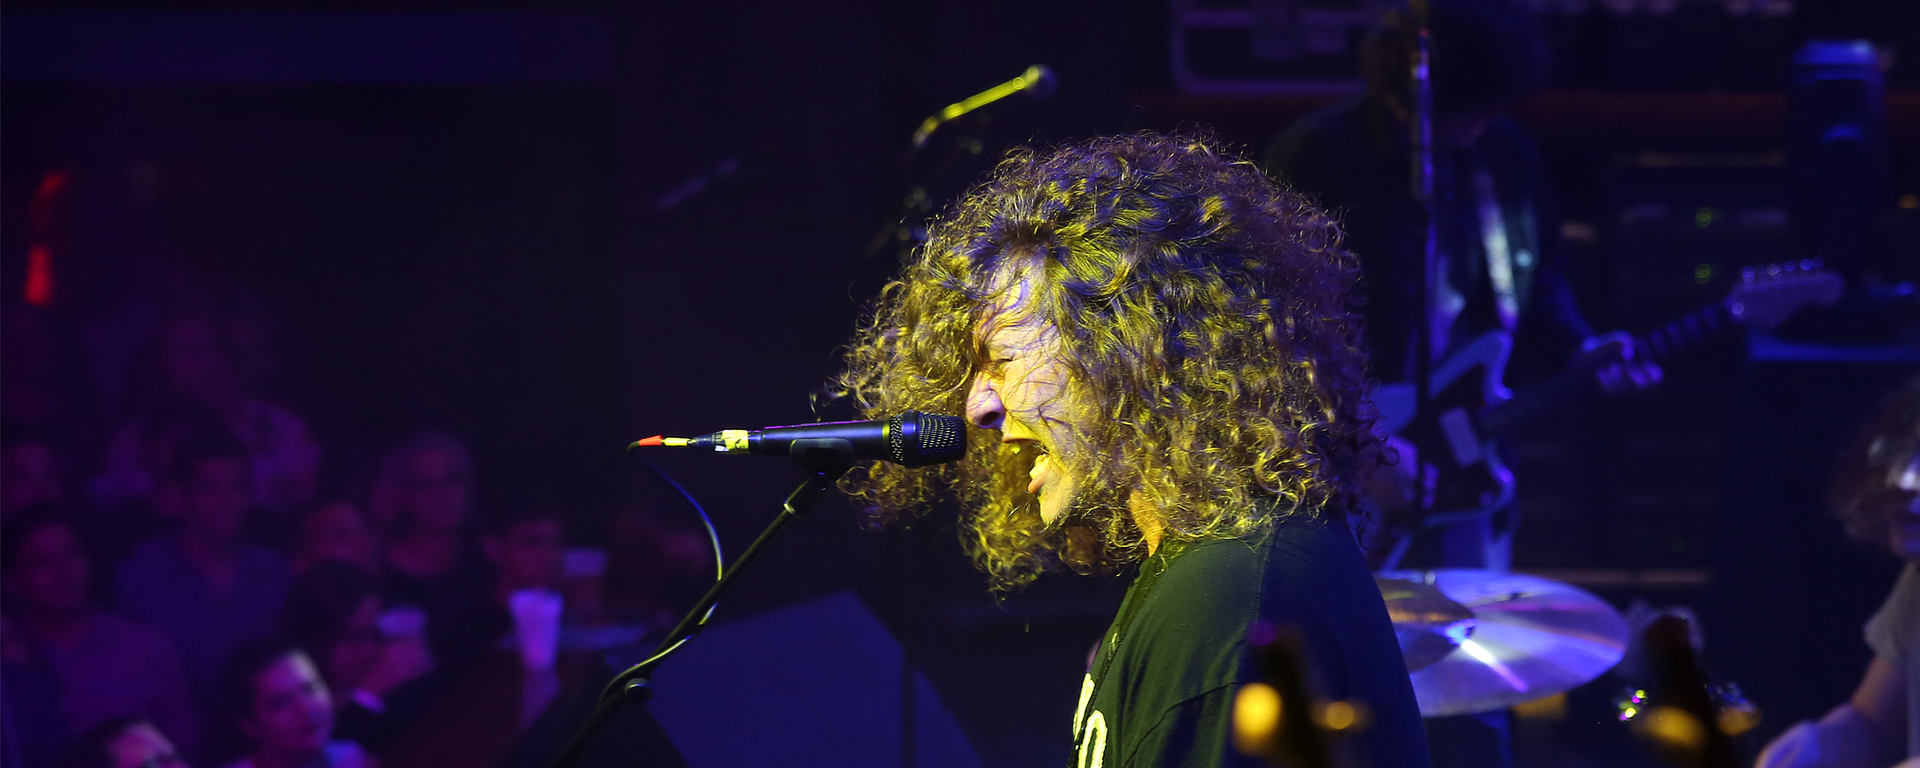 Joe White with LEWITT MTP 550 DM rocking on stage